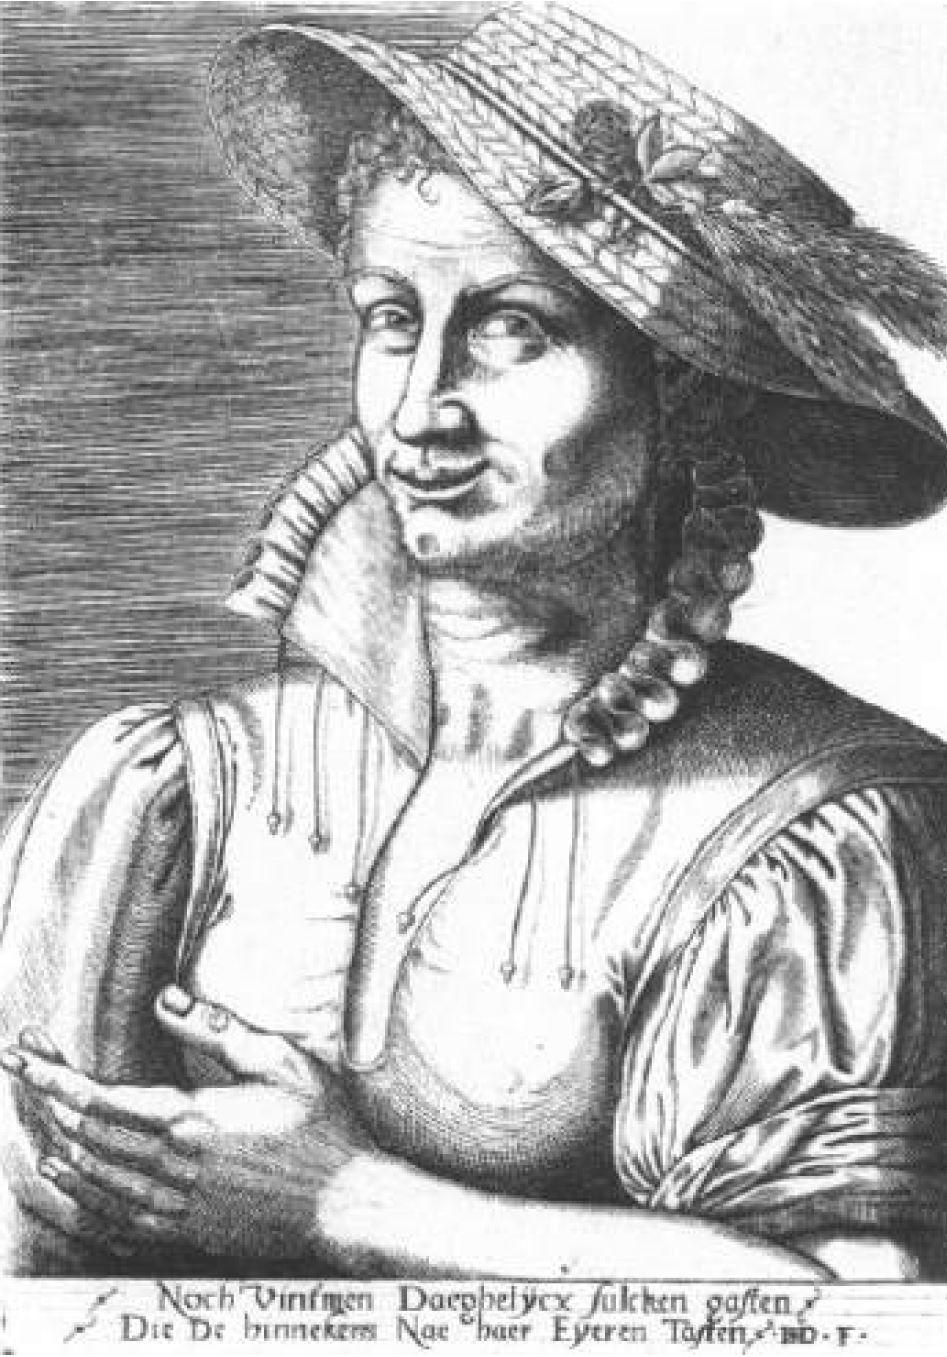 Monogrammist ISD Femme avec un chapeau de paille Amsterdam, Rijksprentenkabinet